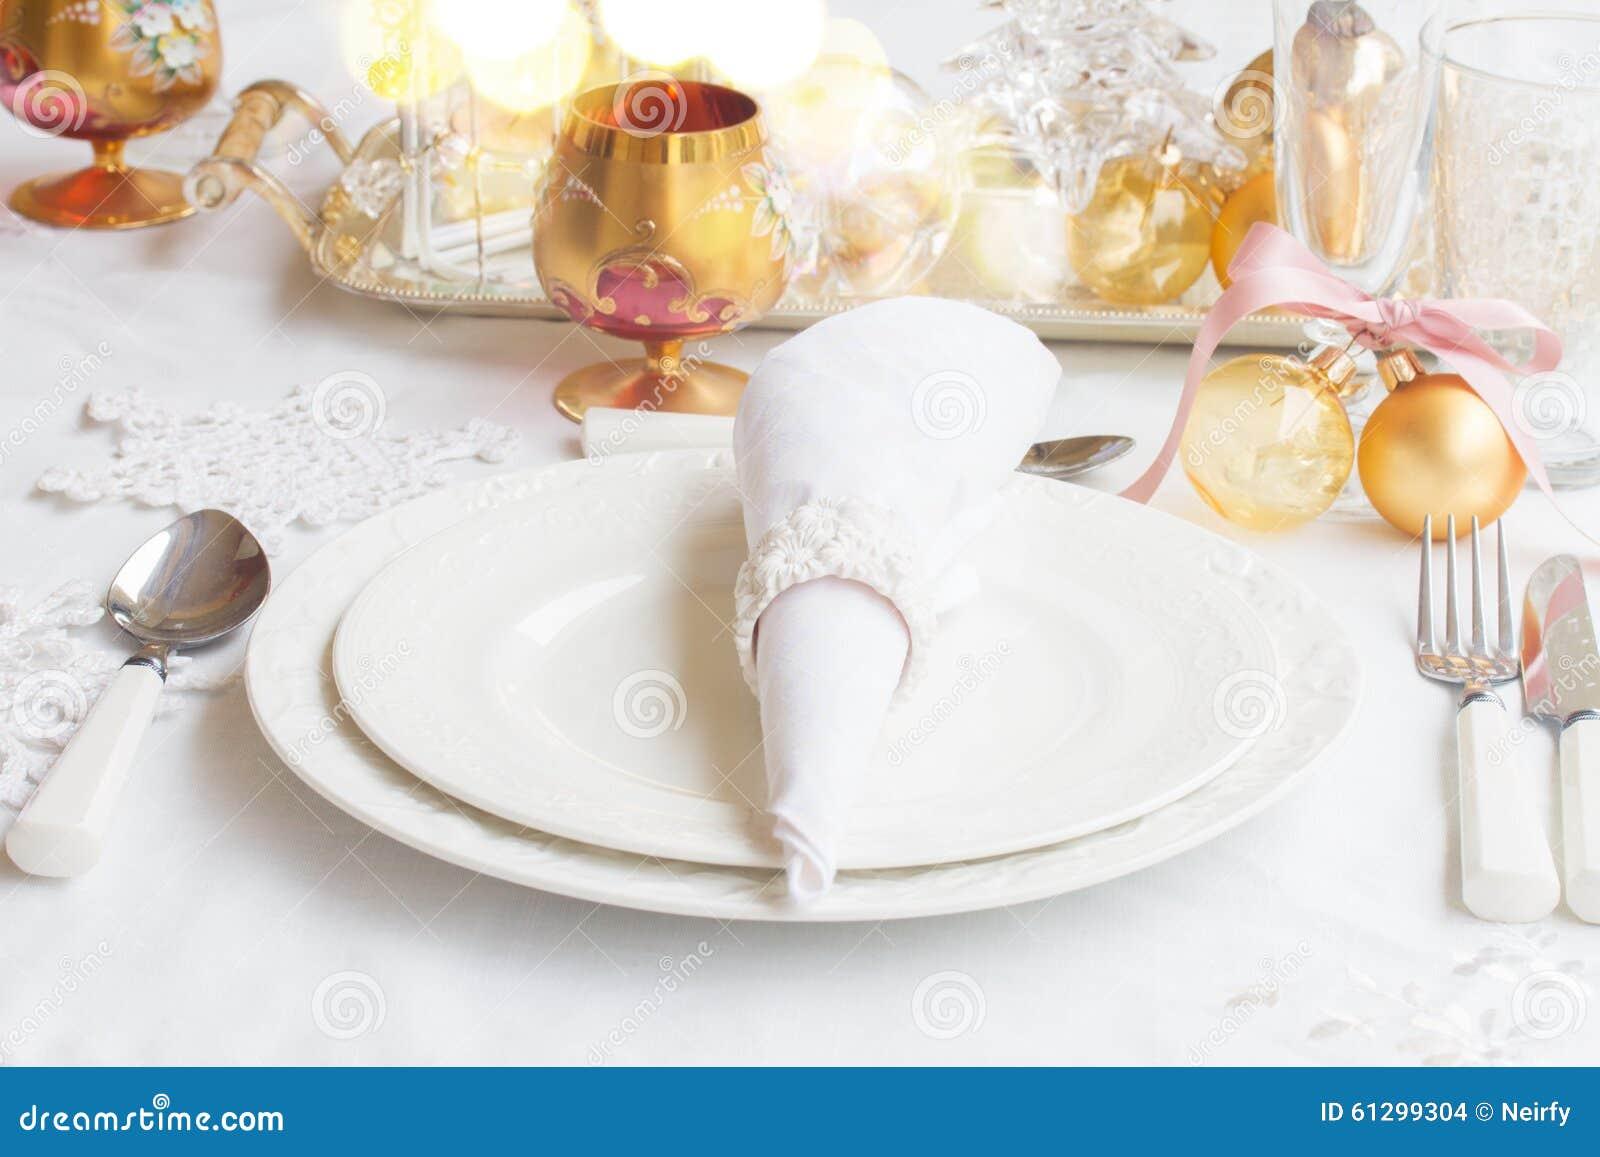 Christmas Tableware Set Stock Photo Image Of Cutlery 61299304